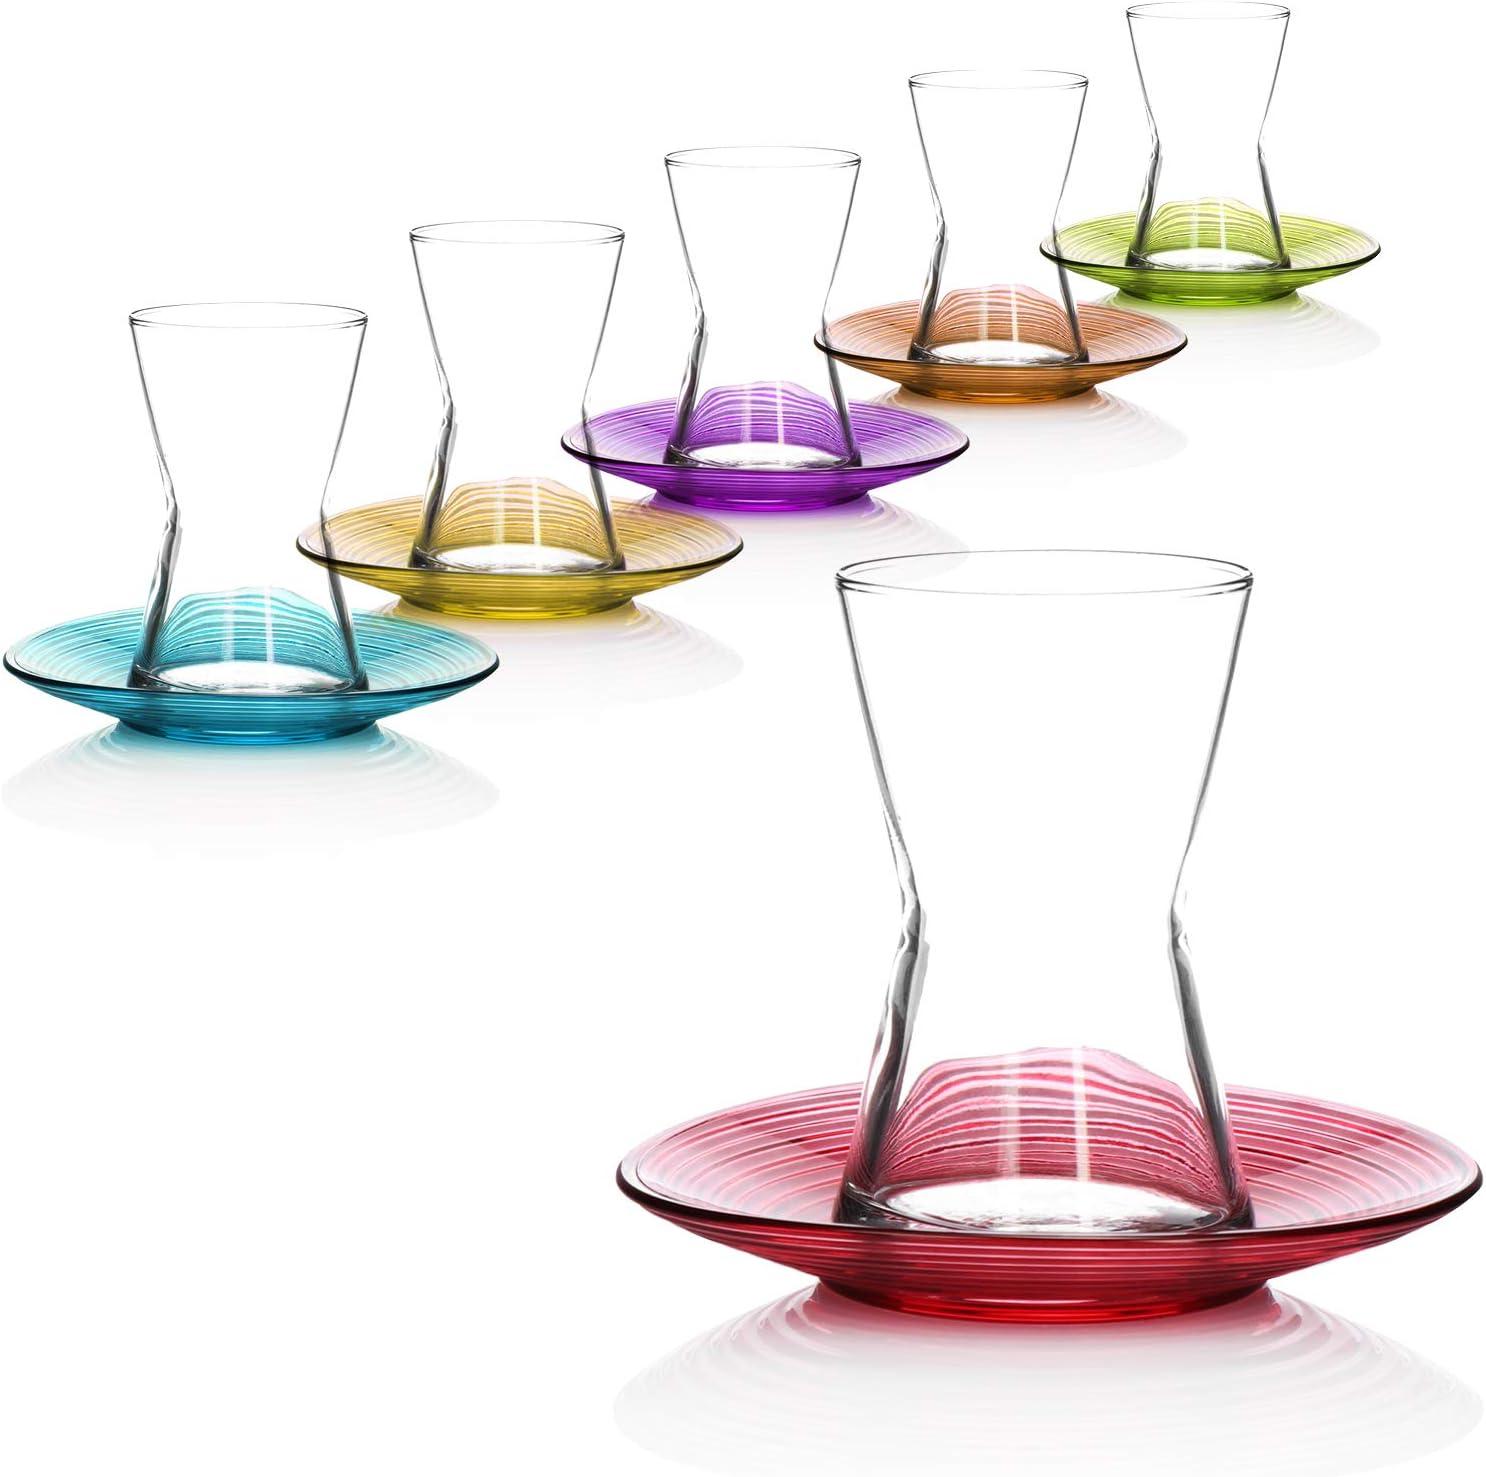 com-four/® 12-piece tea glass set original oriental /Çay set in bright colors Turkish tea glasses with saucers